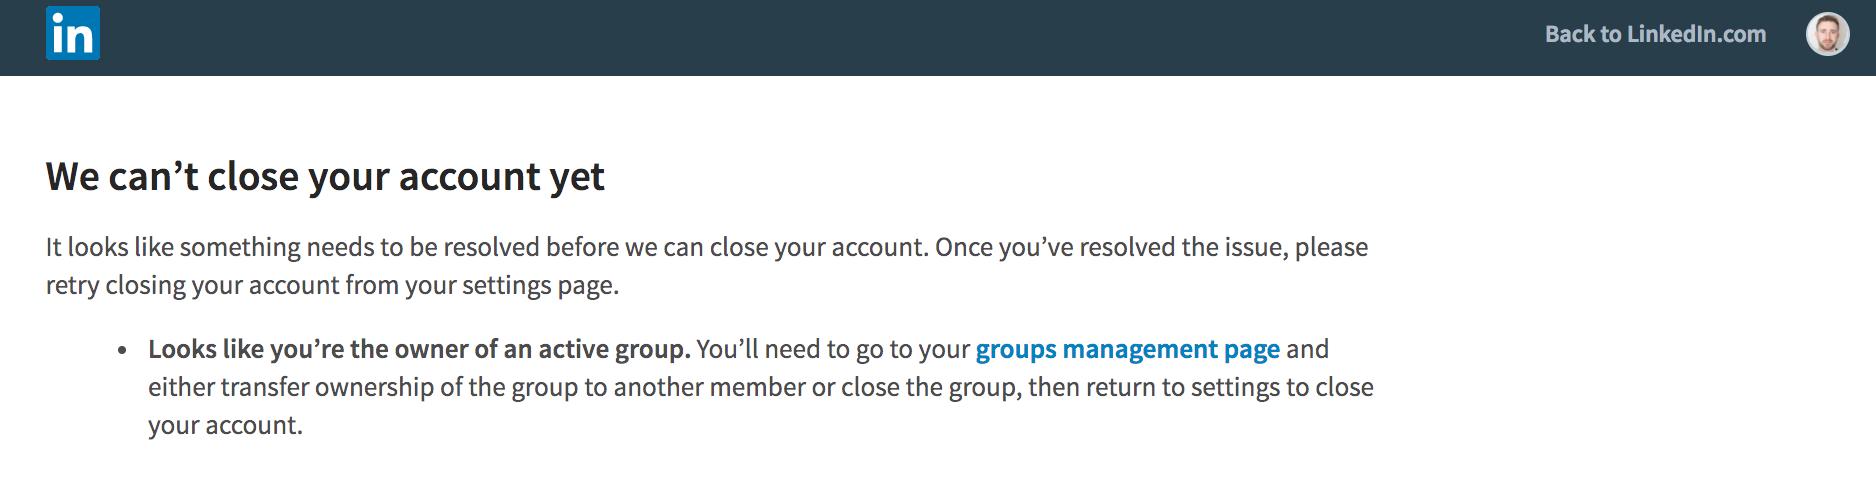 Linkedin close account upon death